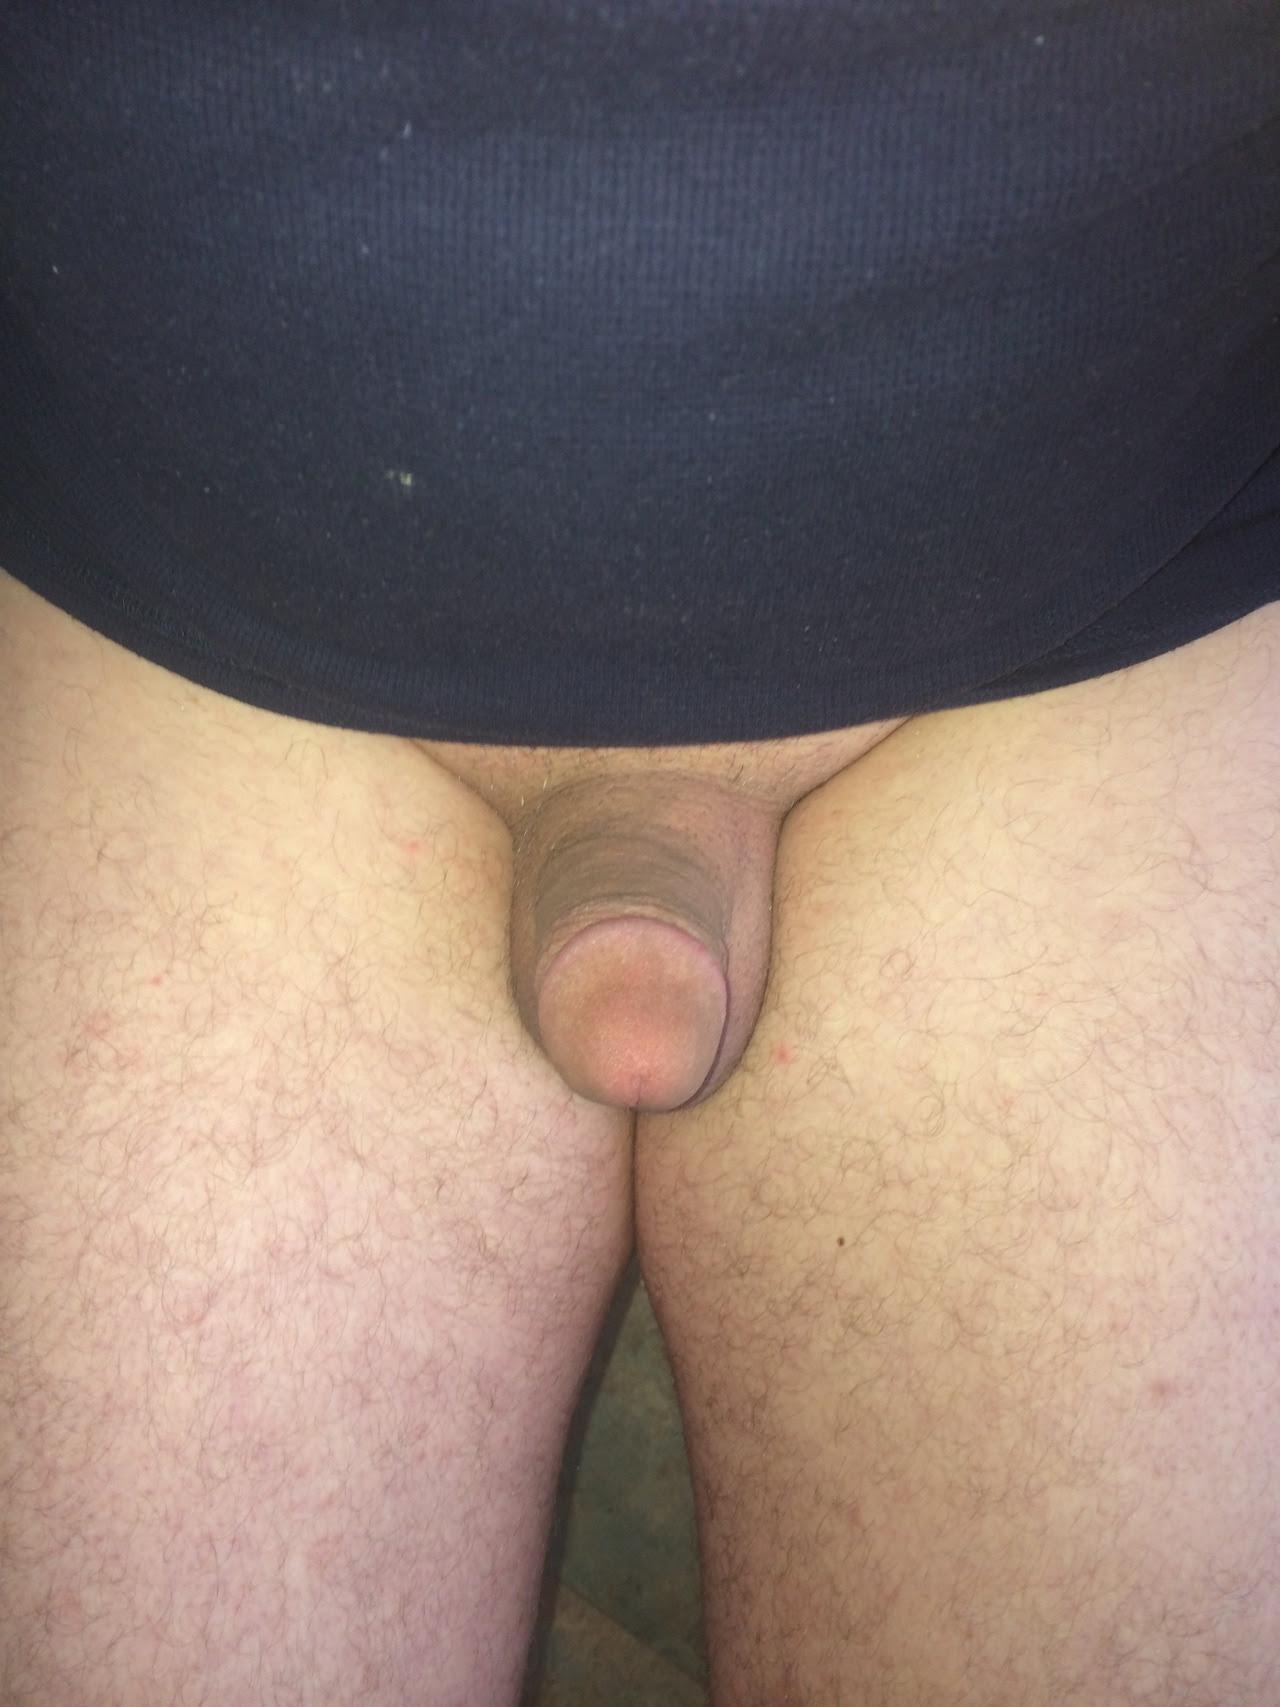 visitando putas pequeño